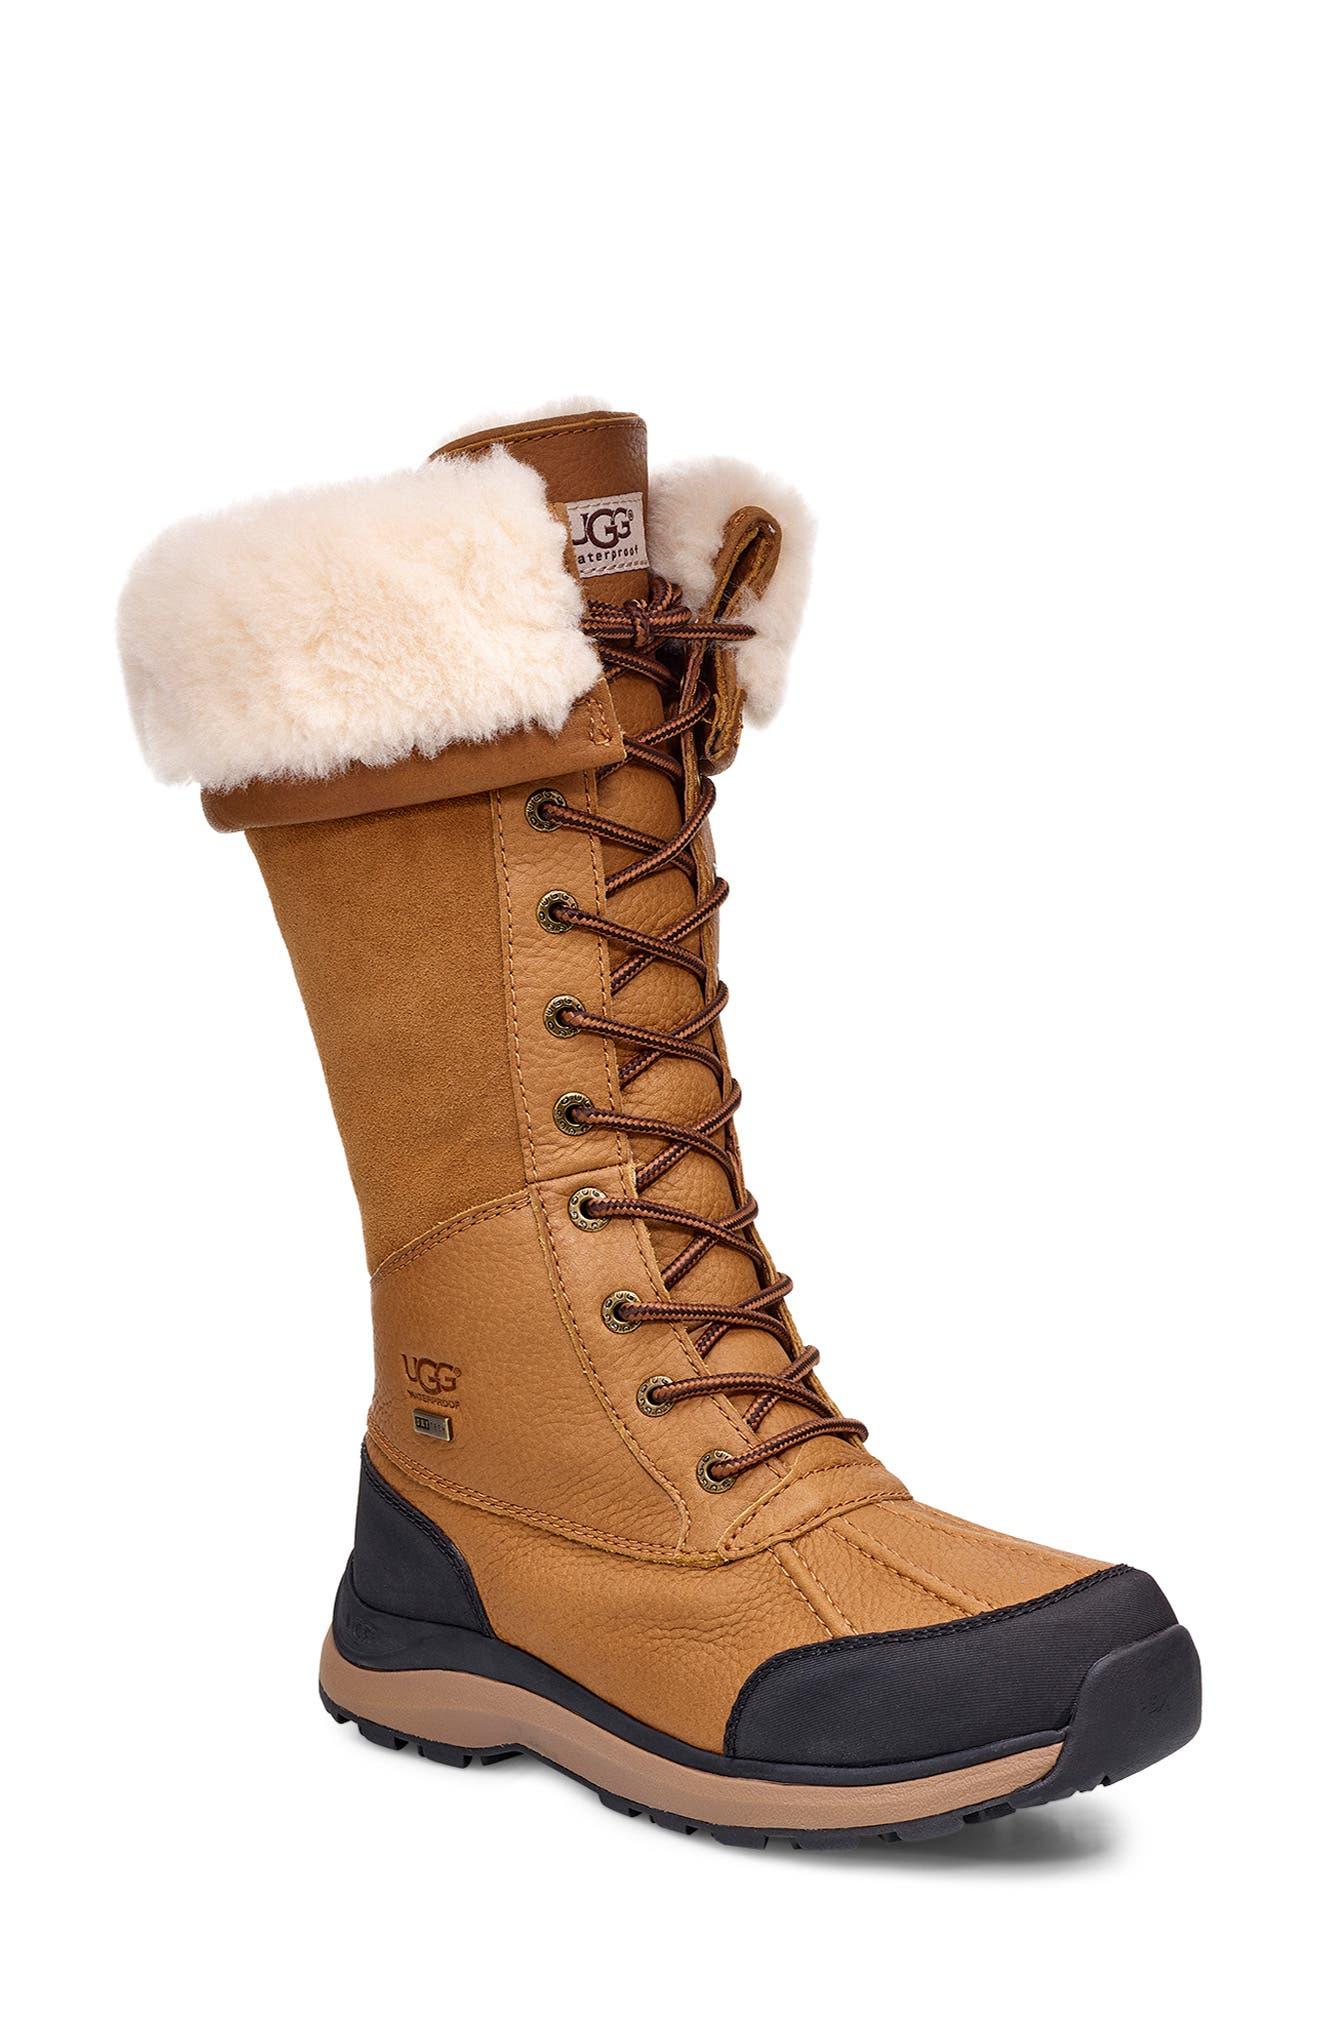 Adirondack II Waterproof Tall Boot,                             Main thumbnail 1, color,                             CHESTNUT